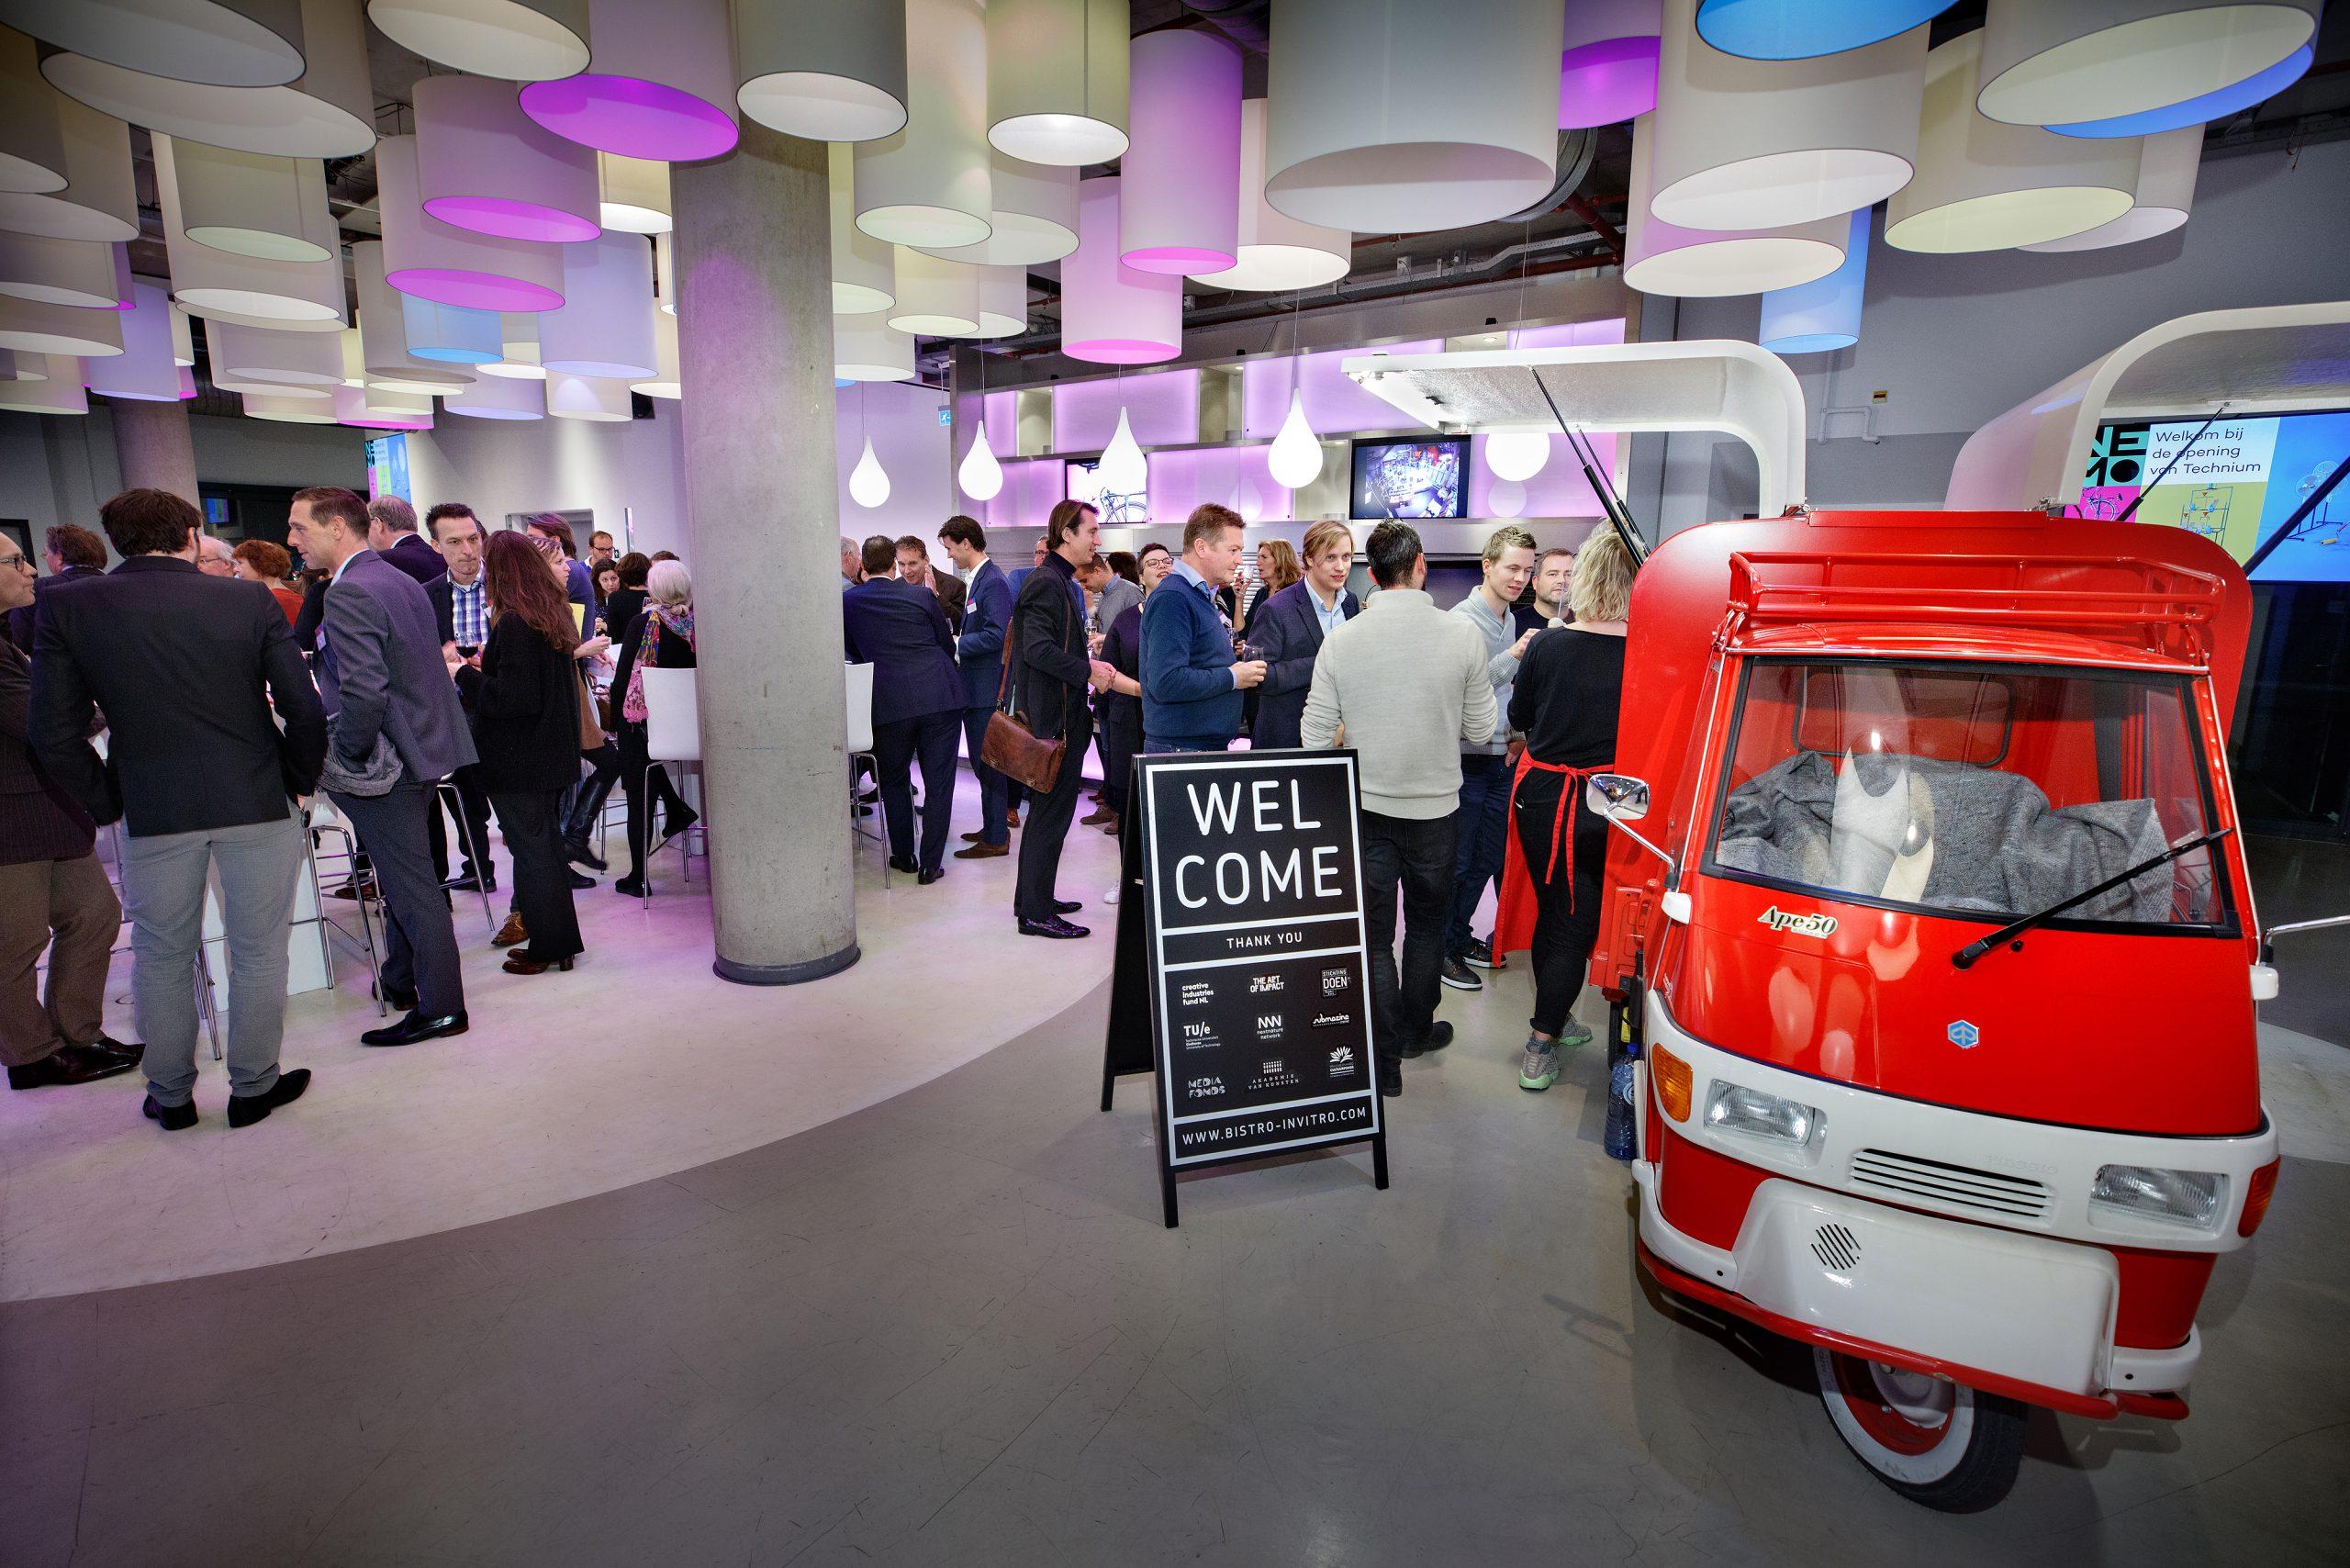 NEMO; Opening Technium, Meat Ice Cream